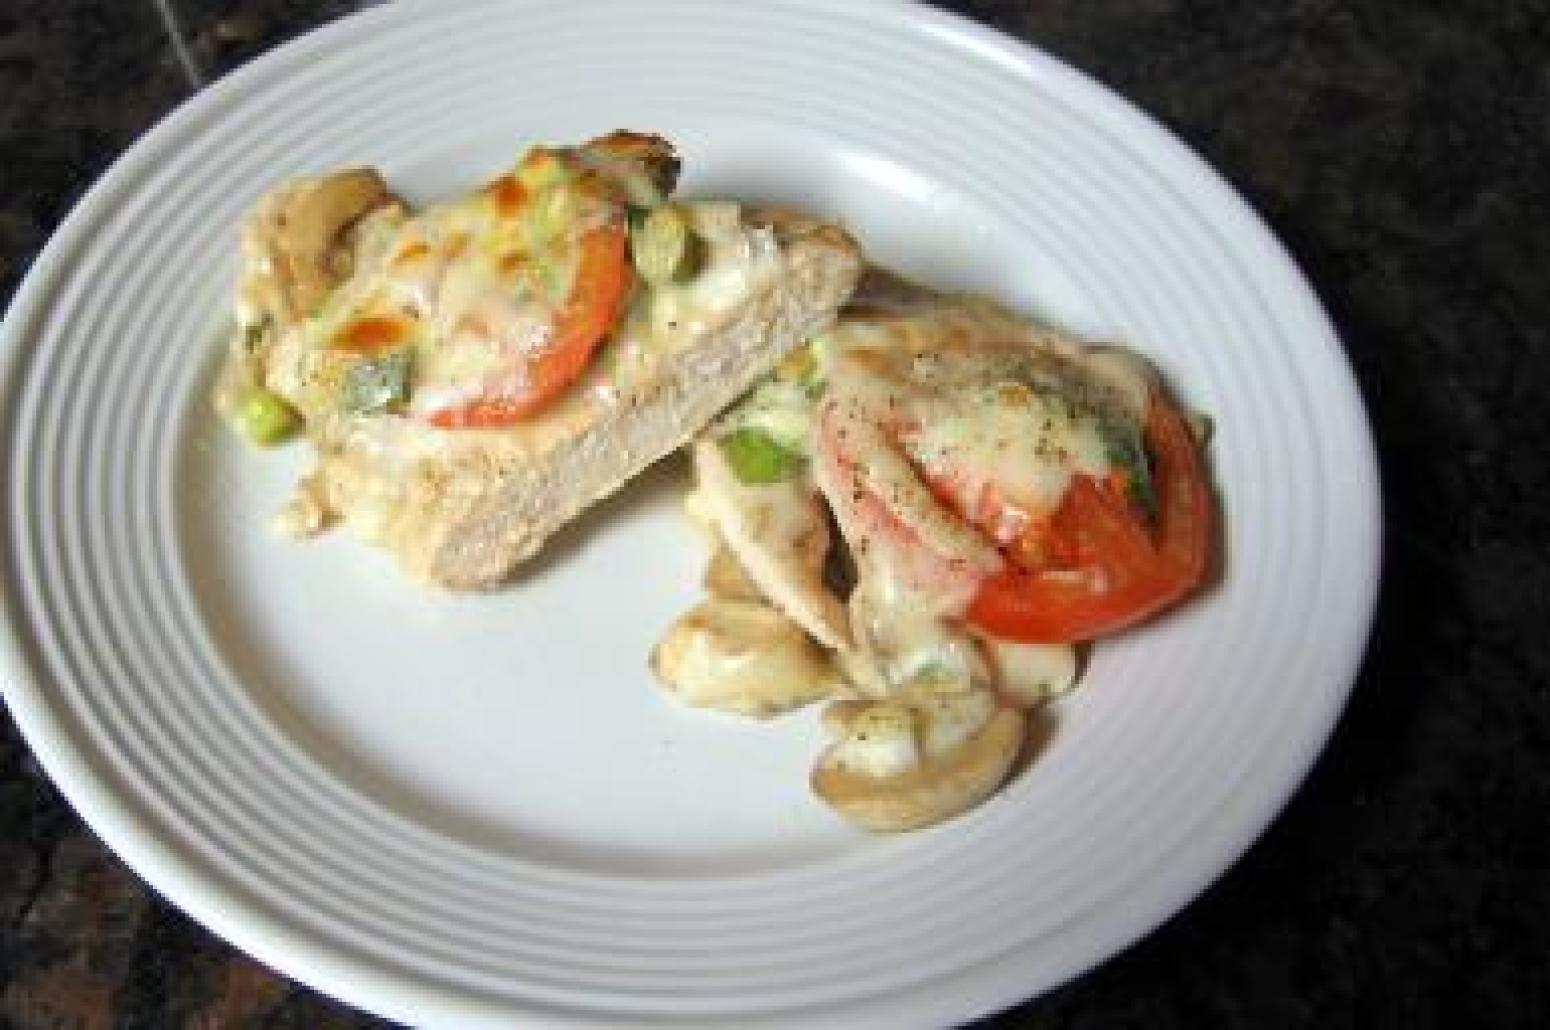 Baked Shells With Tomato And Mozzarella Recipes — Dishmaps